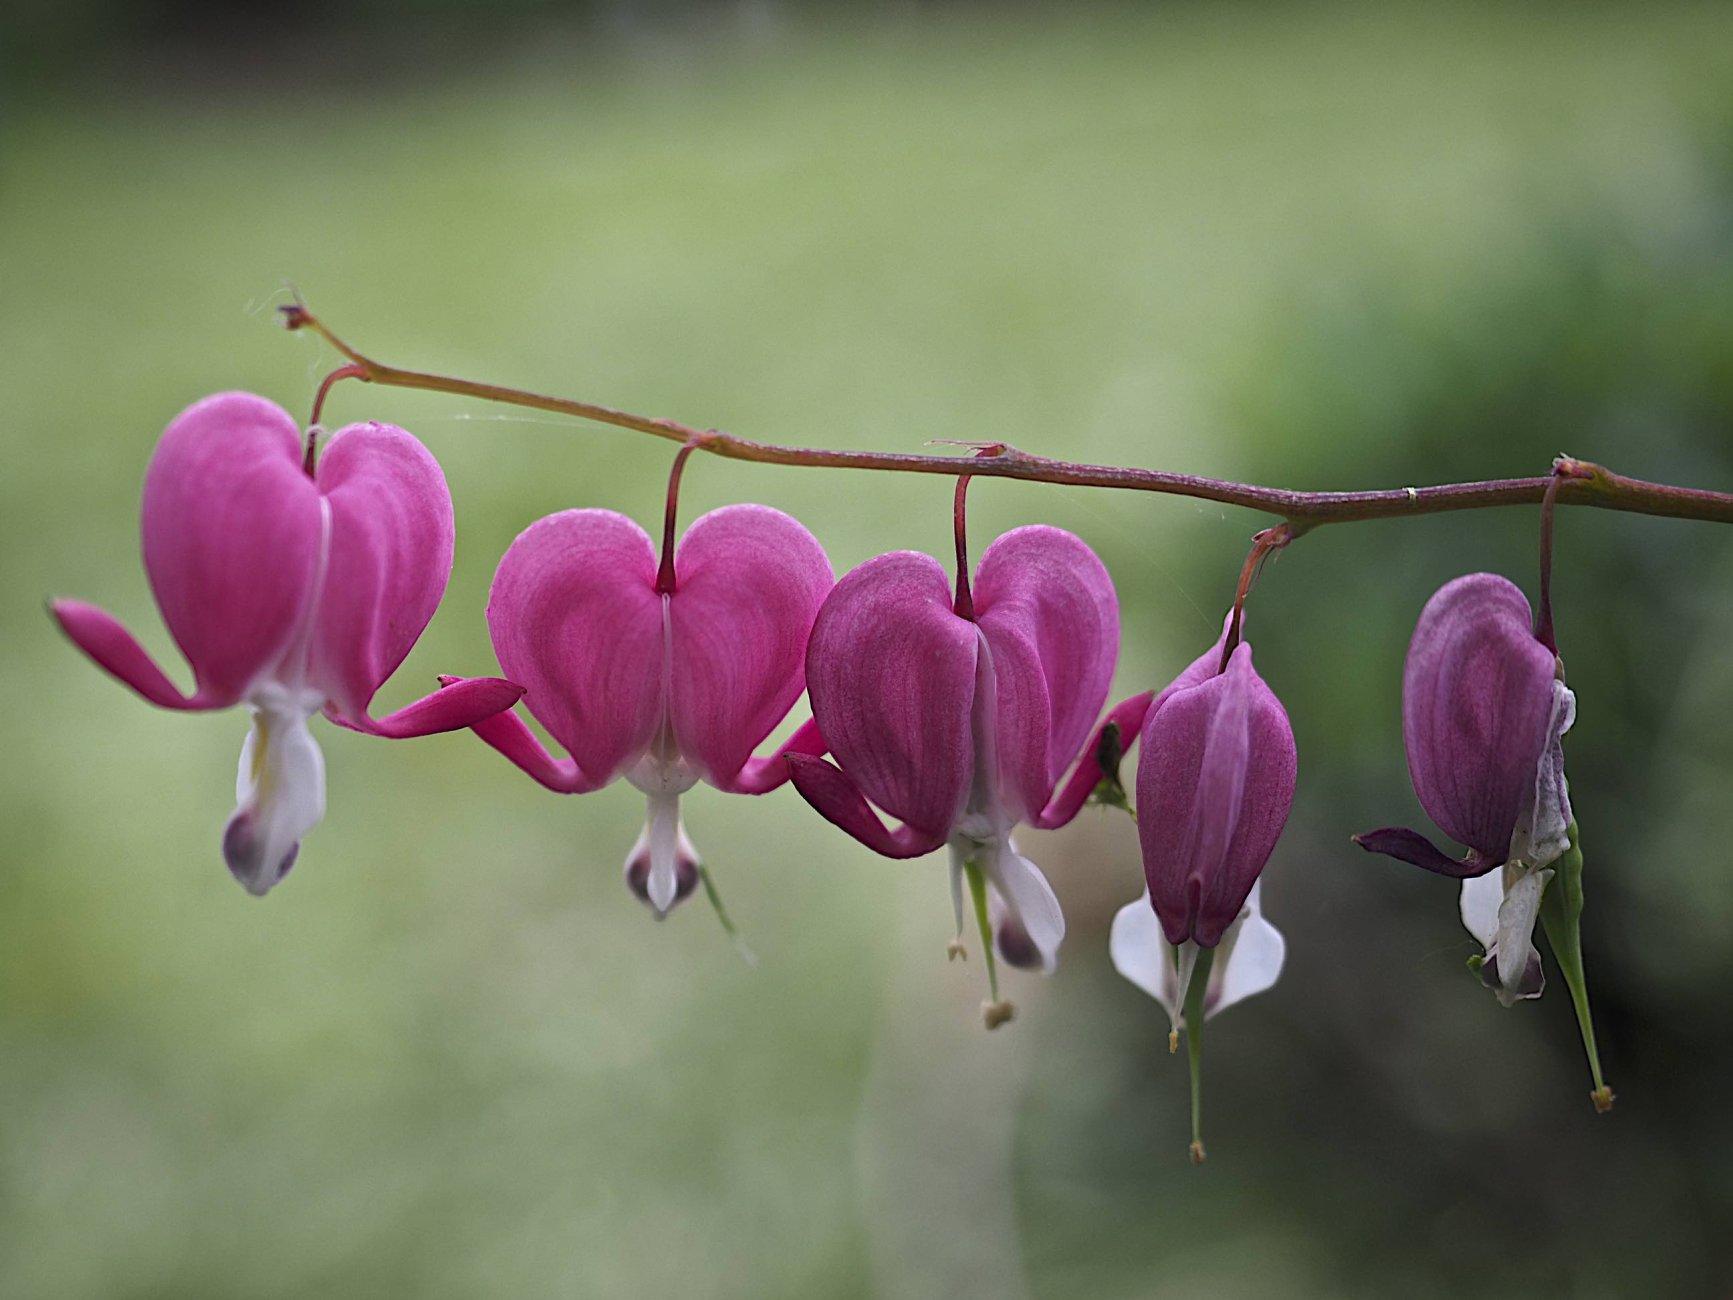 Flowers of Spring #3